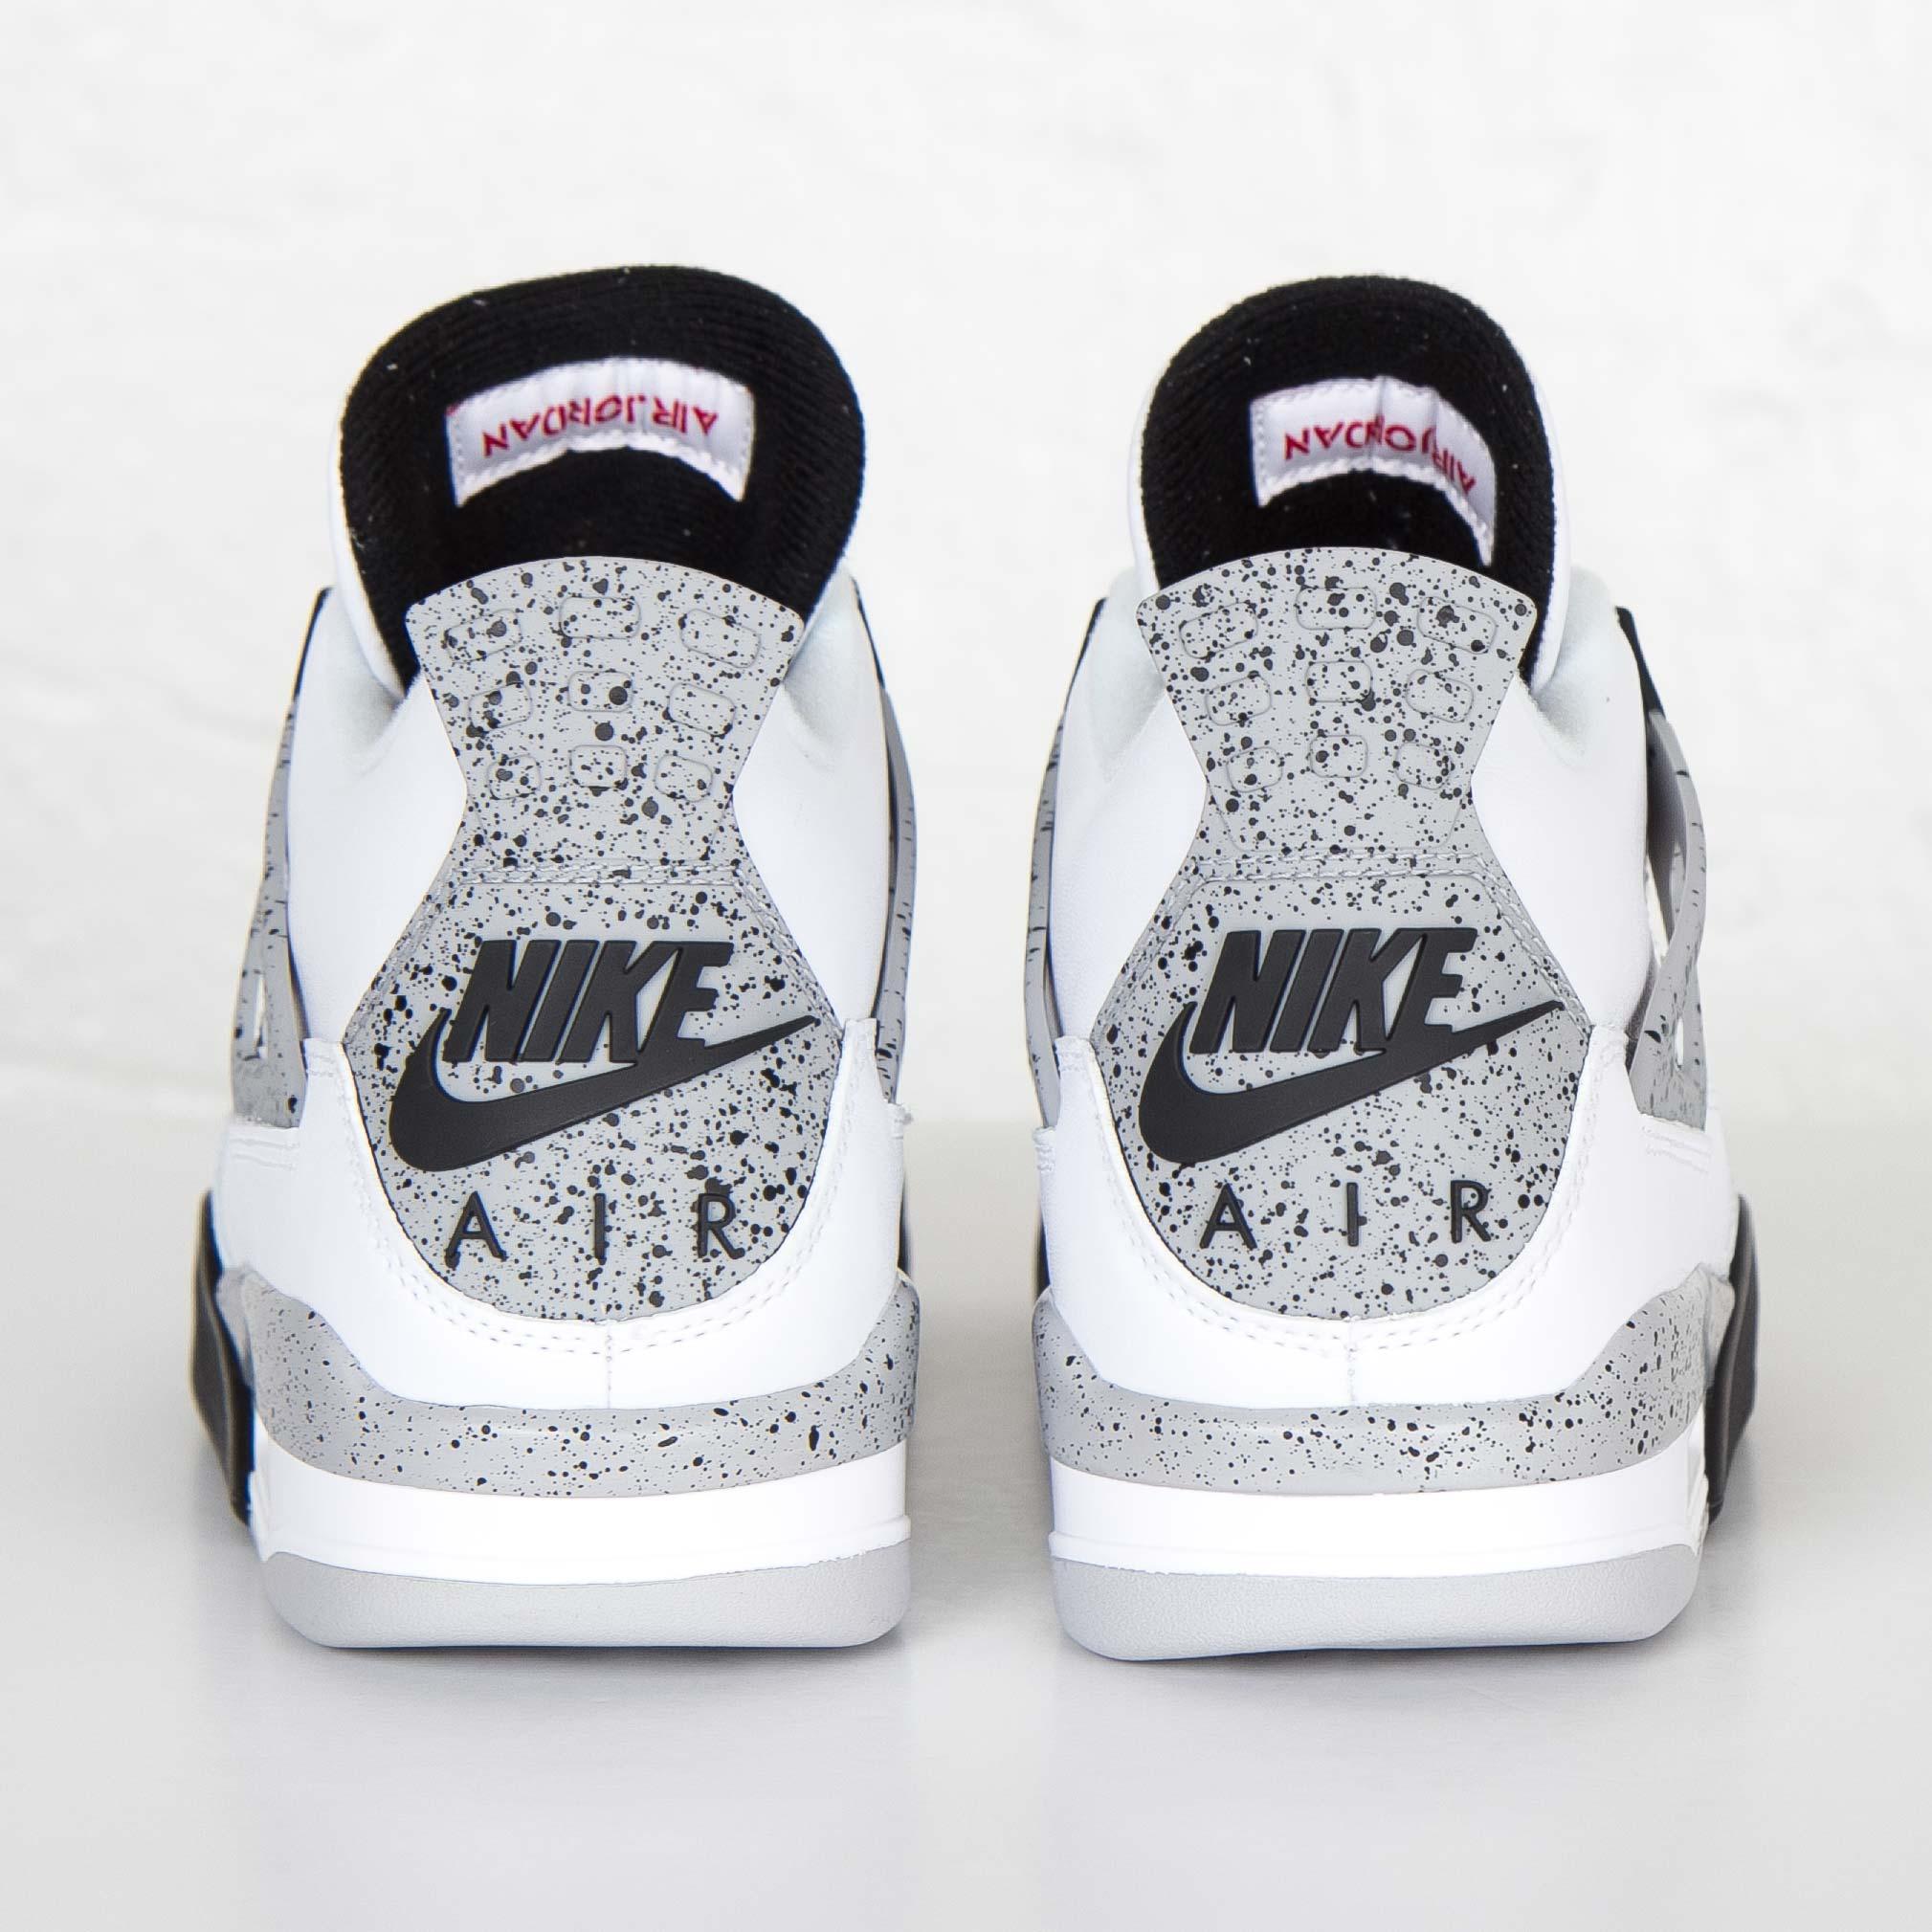 f2e39d0cc Jordan Brand Air Jordan 4 Retro OG - 840606-192 - Sneakersnstuff   sneakers  & streetwear online since 1999